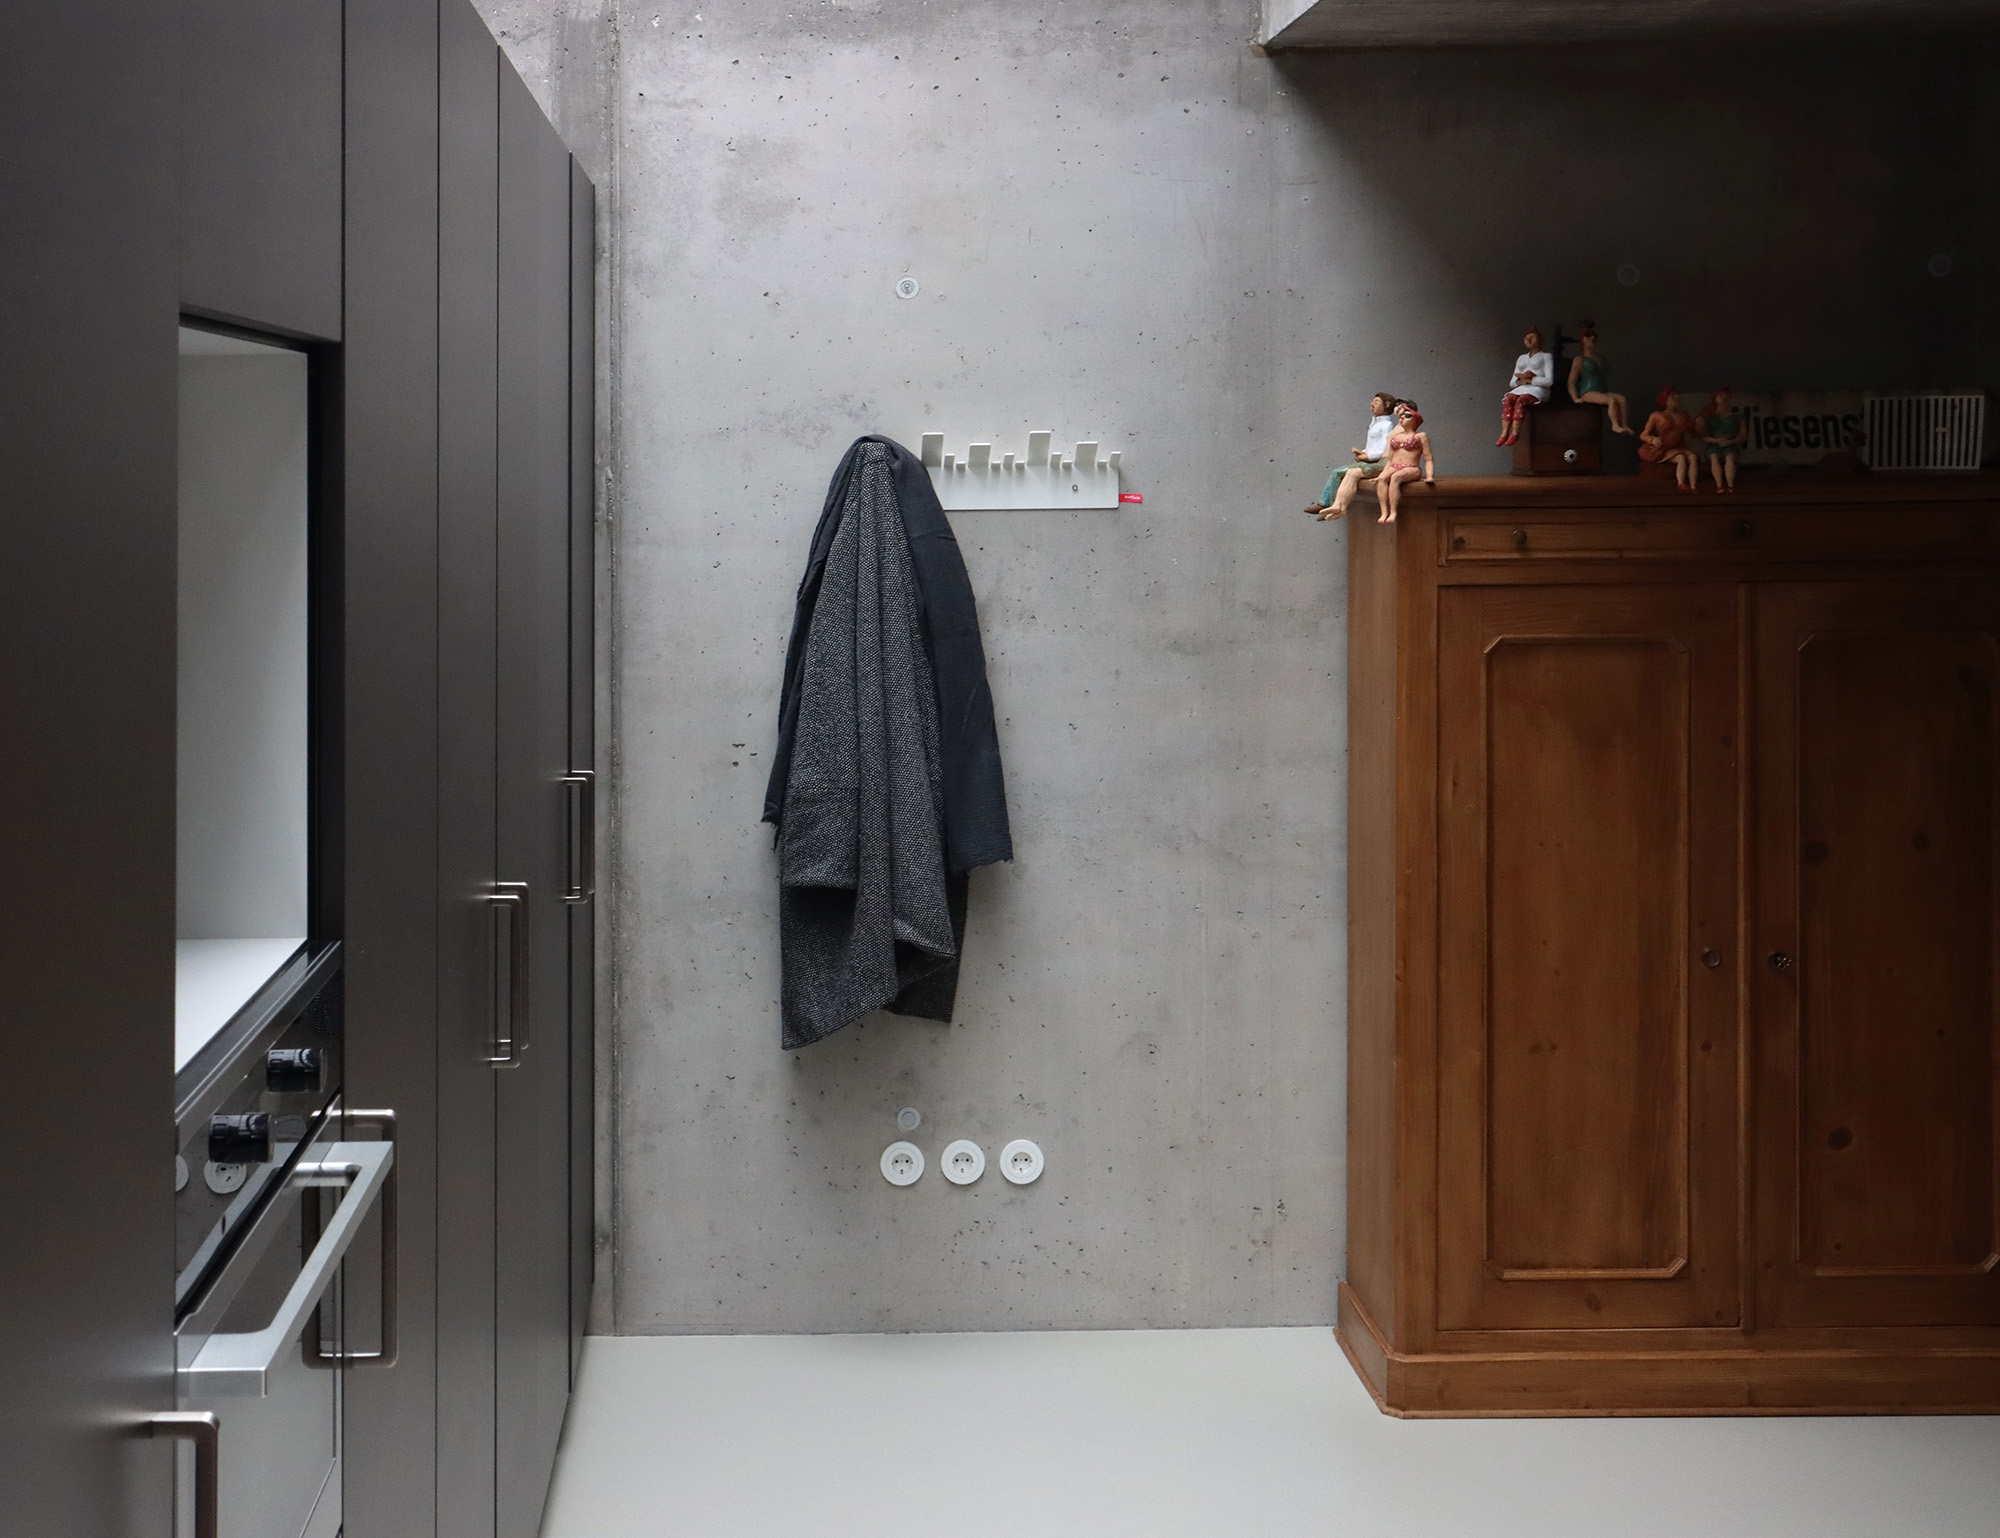 R_S_IMG_1710_Quer_OBE_Garderobe_Design_Stadtteile